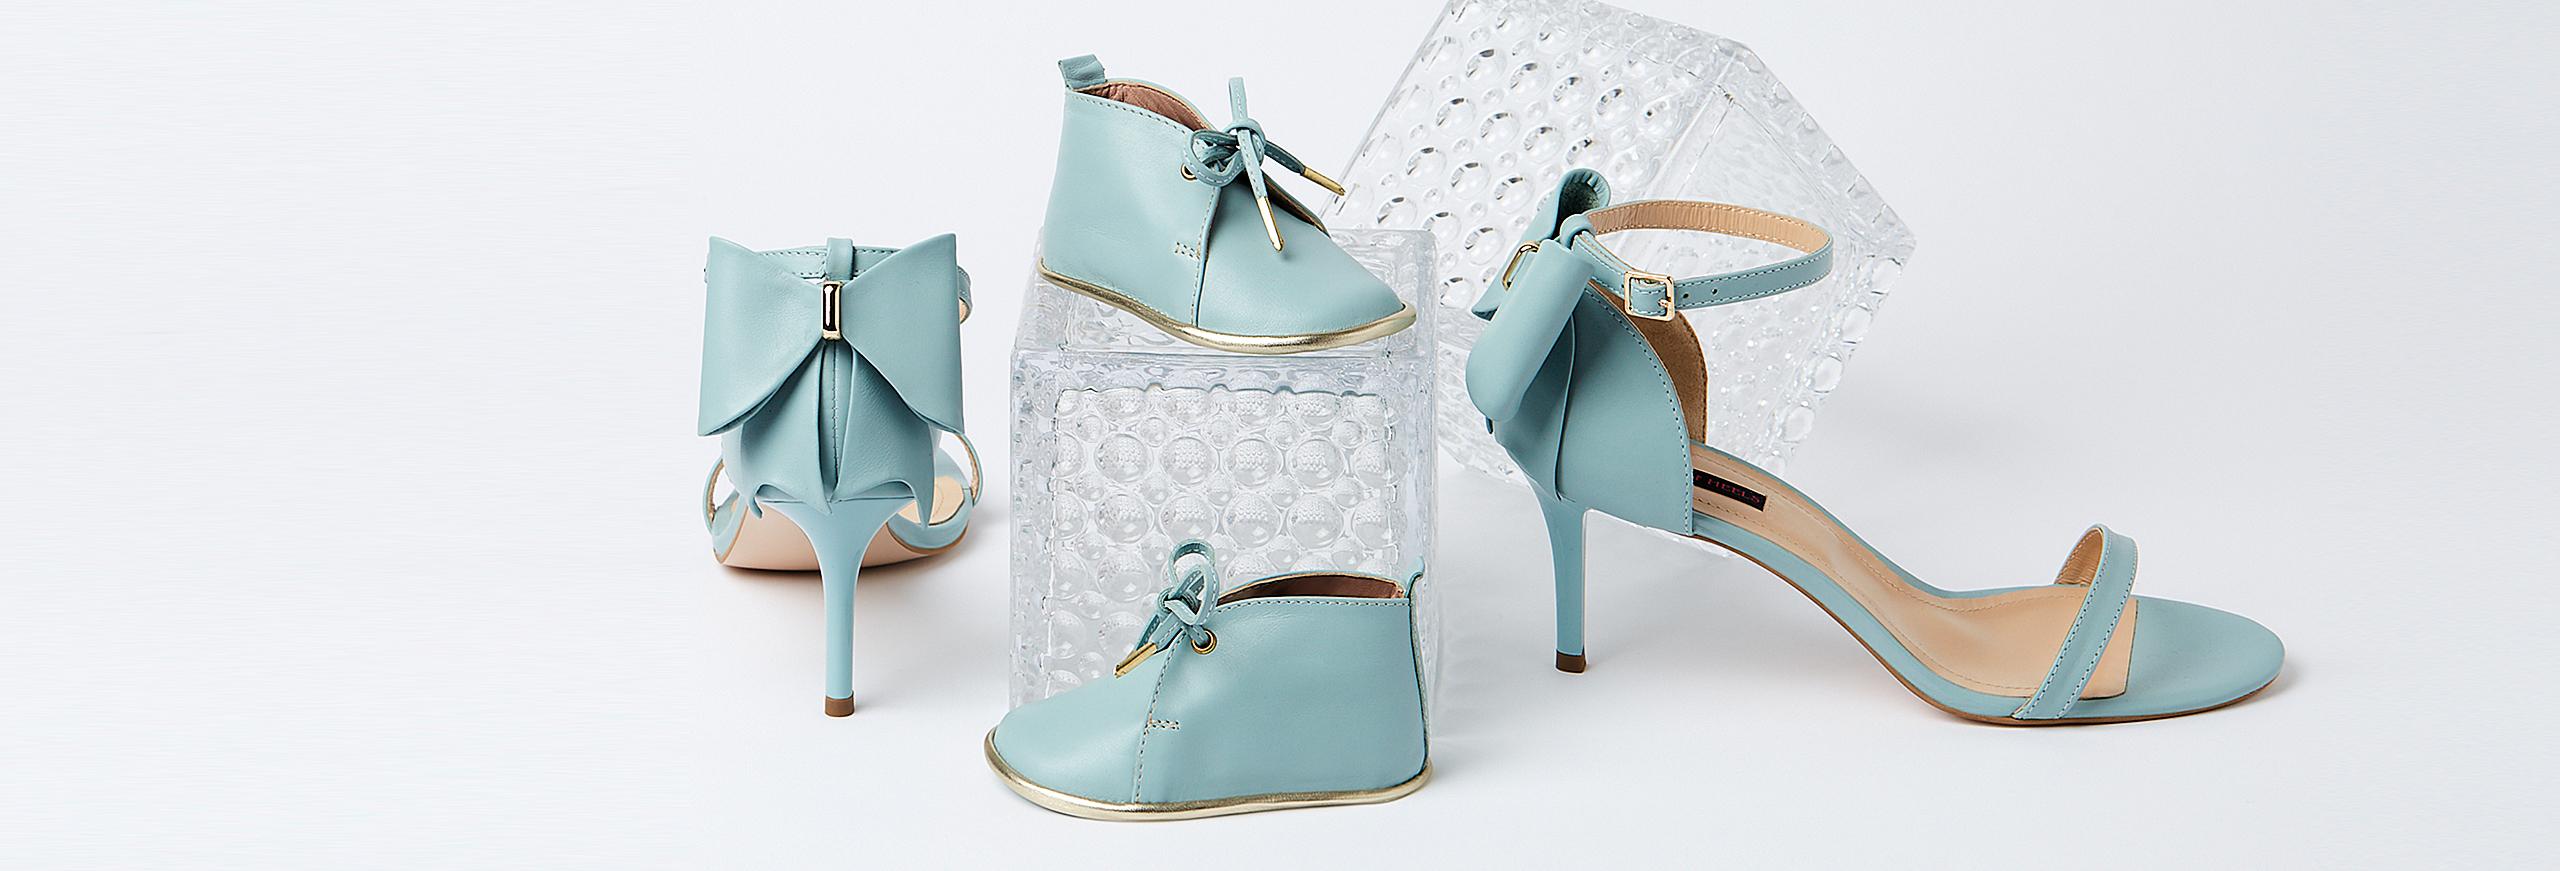 pantofi premergatori copii